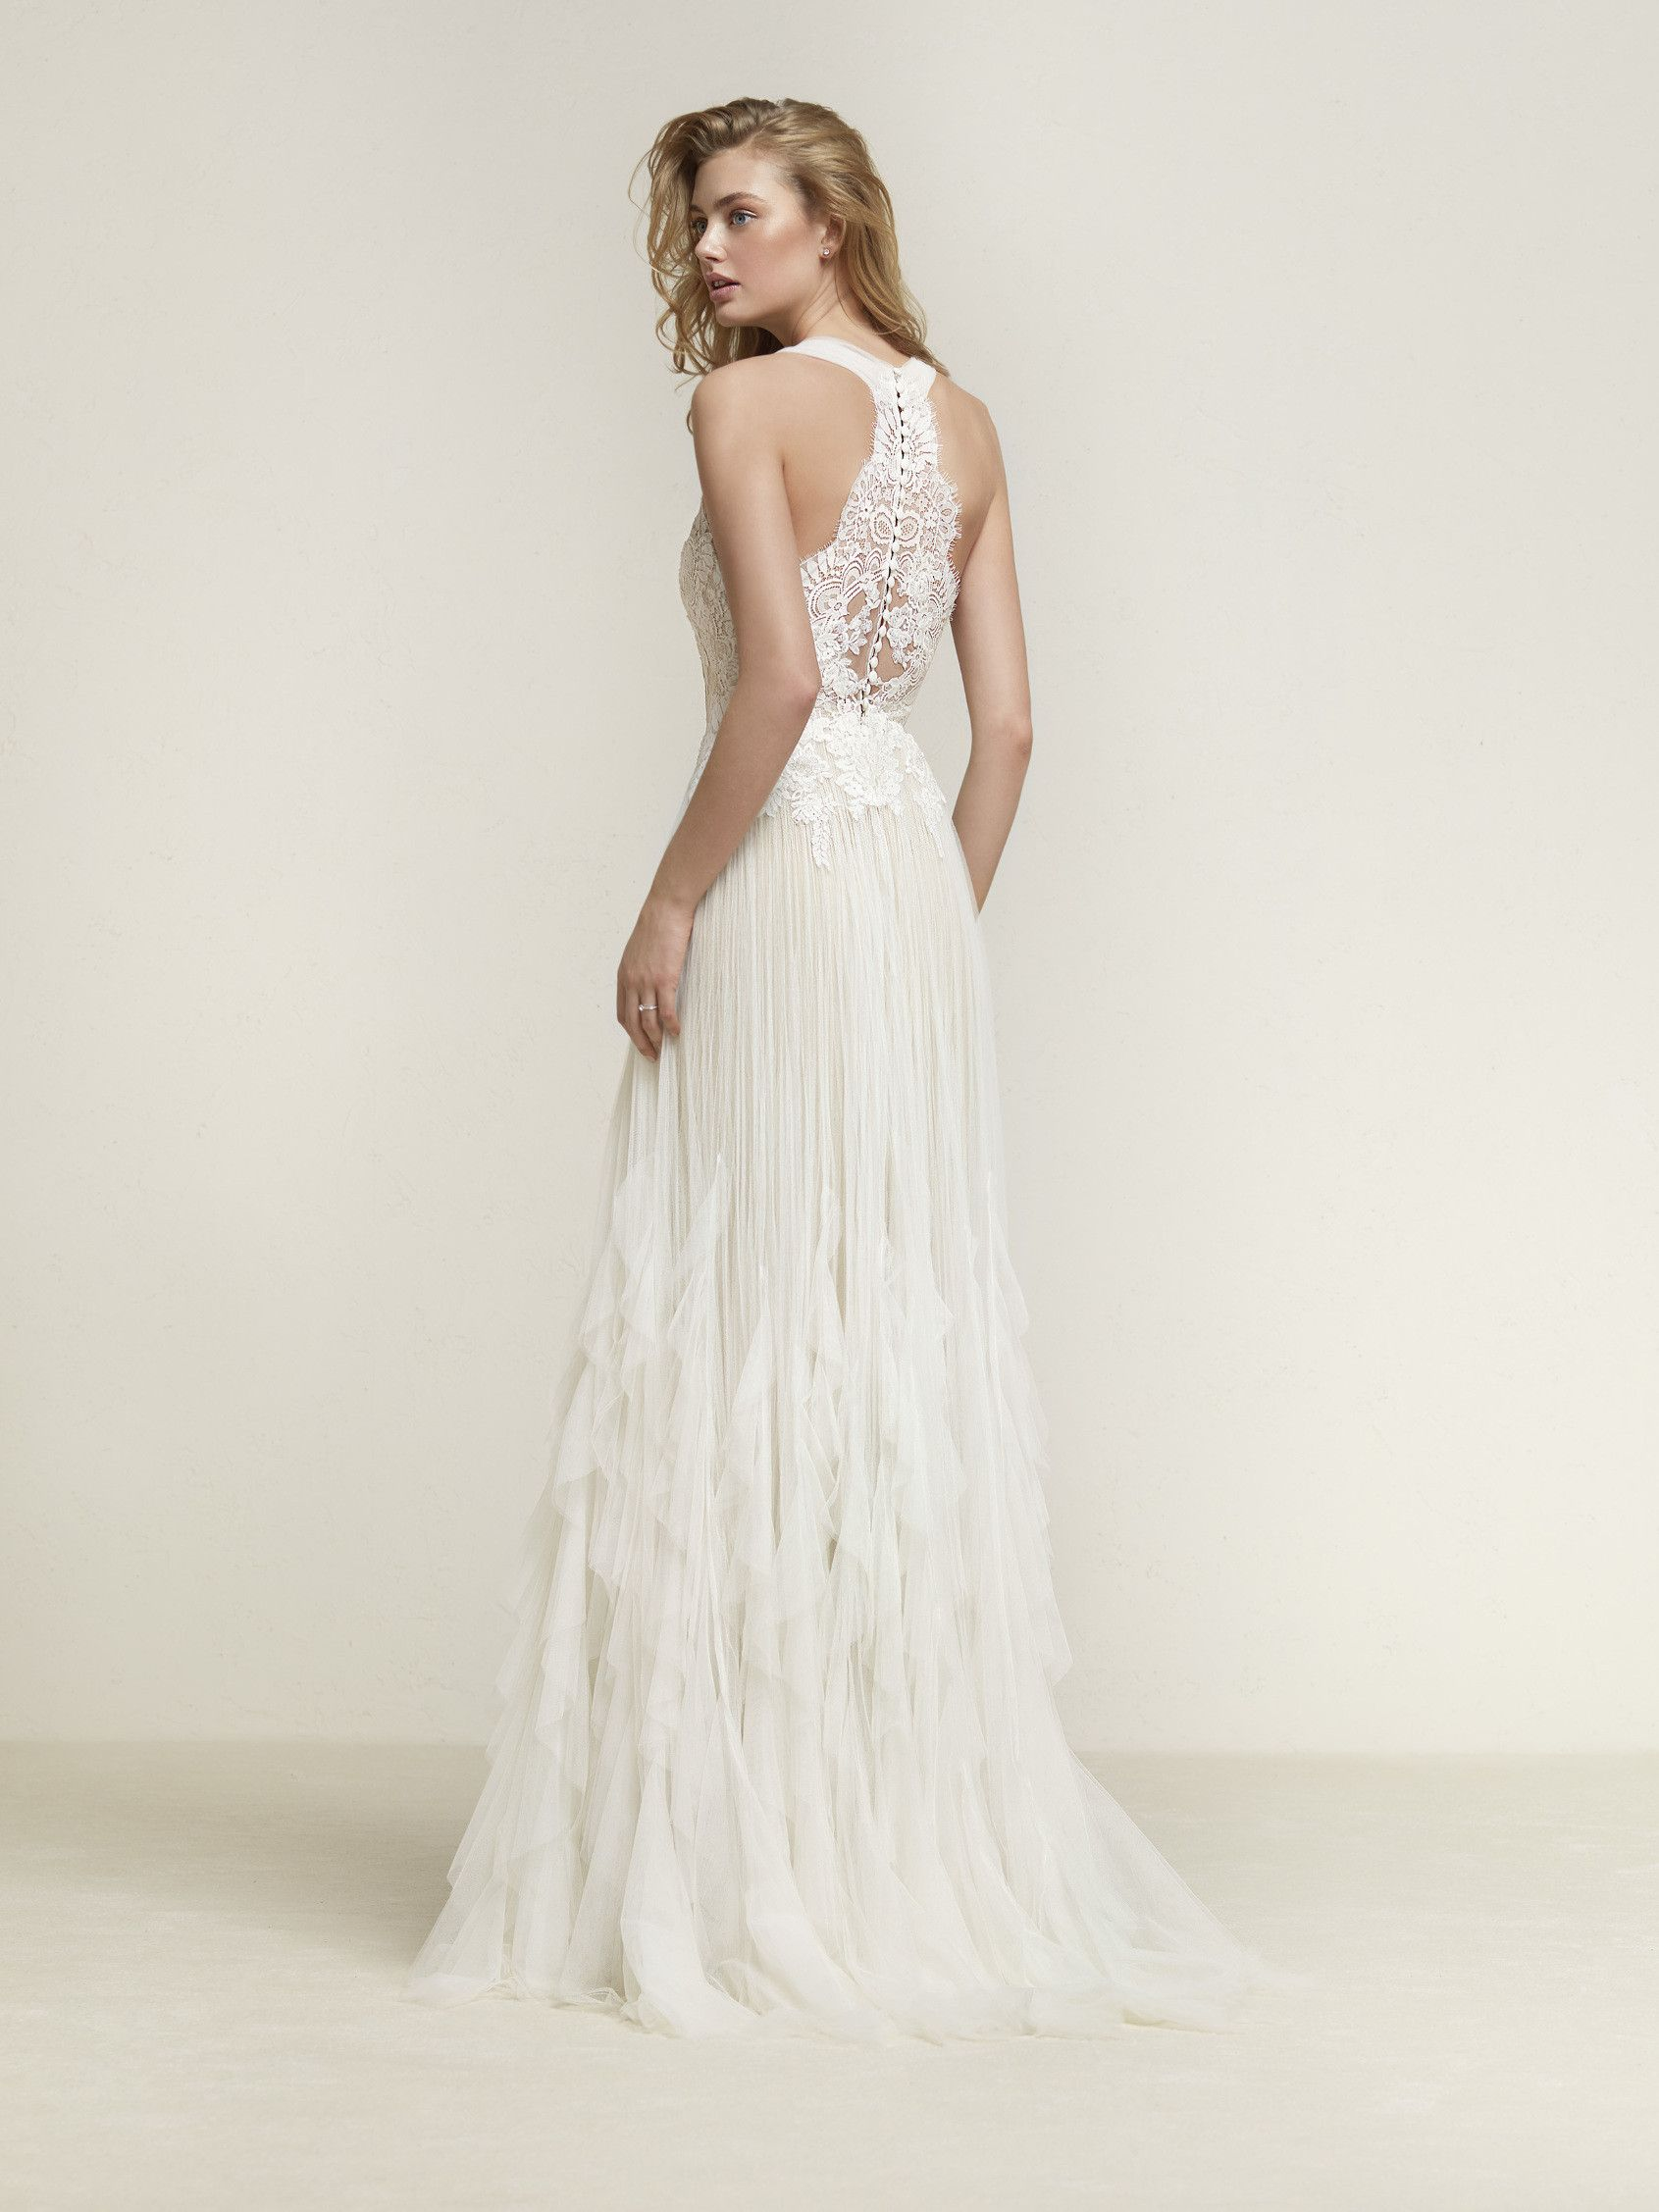 Vestido de noiva folhos | Dresses | Pinterest | Hochzeitskleider ...